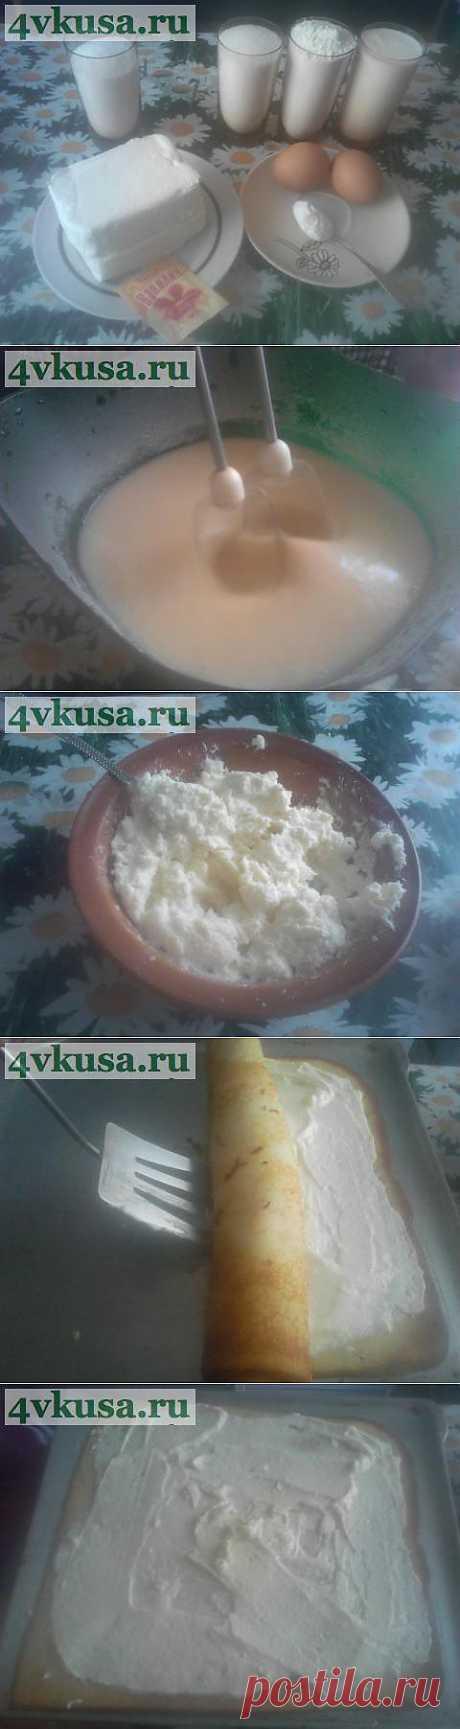 "Рулетик ""Минимум затрат"" | 4vkusa.ru"